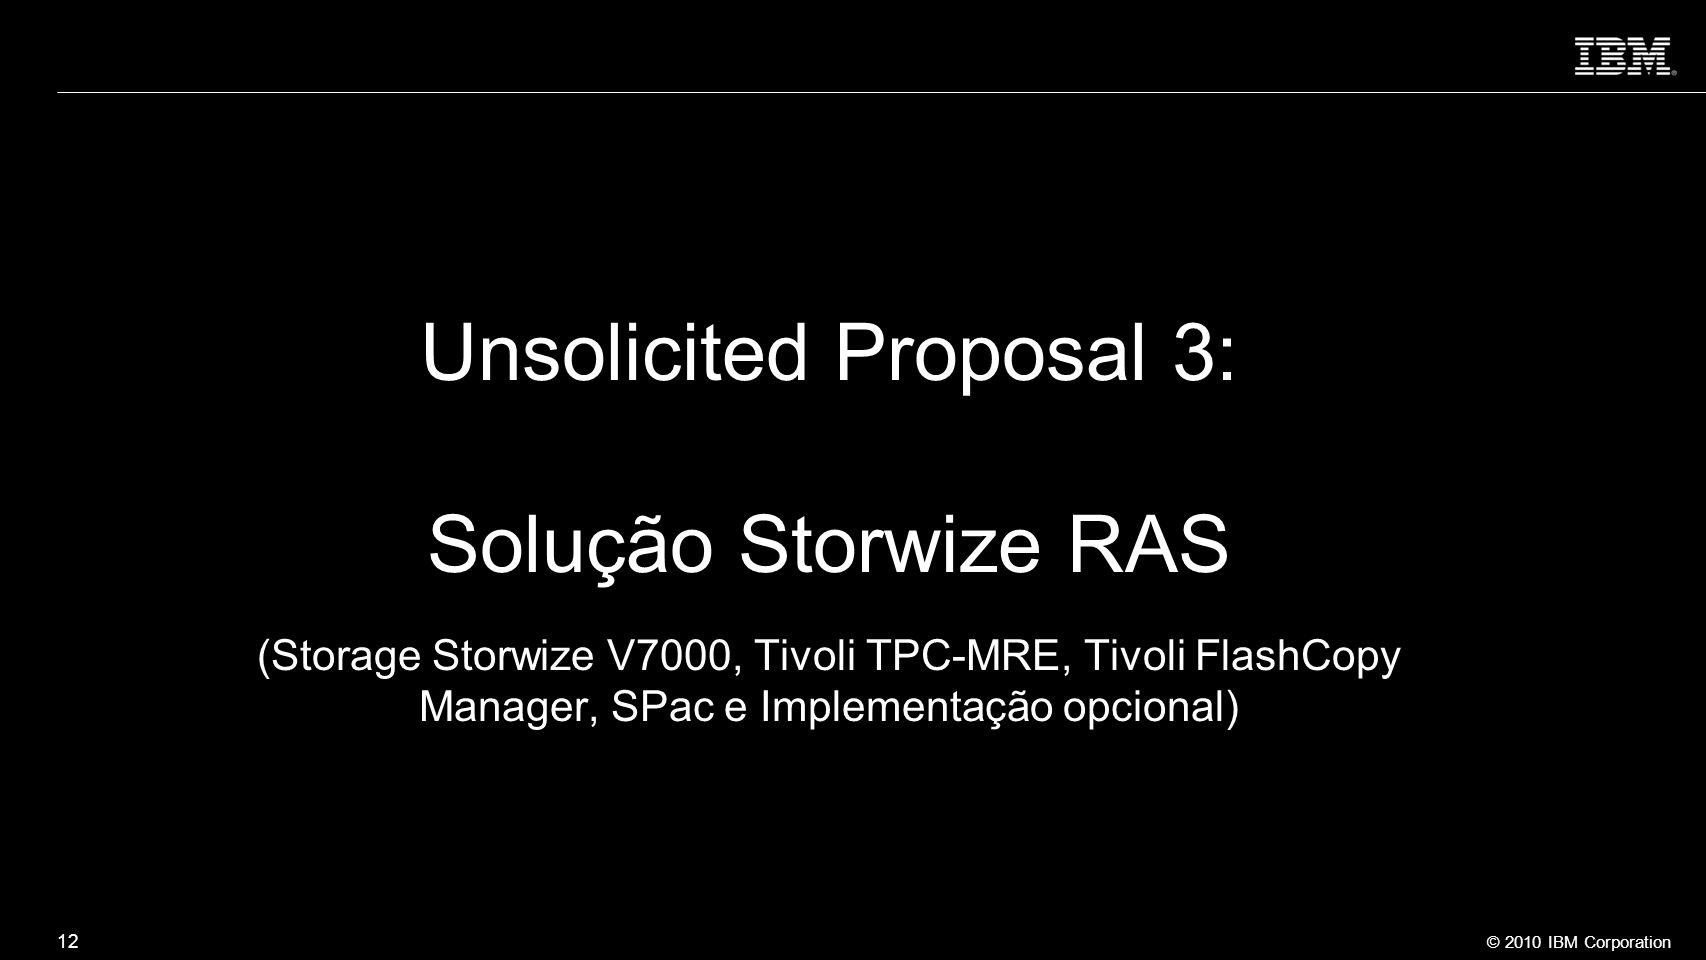 © 2010 IBM Corporation 12 Unsolicited Proposal 3: Solução Storwize RAS (Storage Storwize V7000, Tivoli TPC-MRE, Tivoli FlashCopy Manager, SPac e Imple